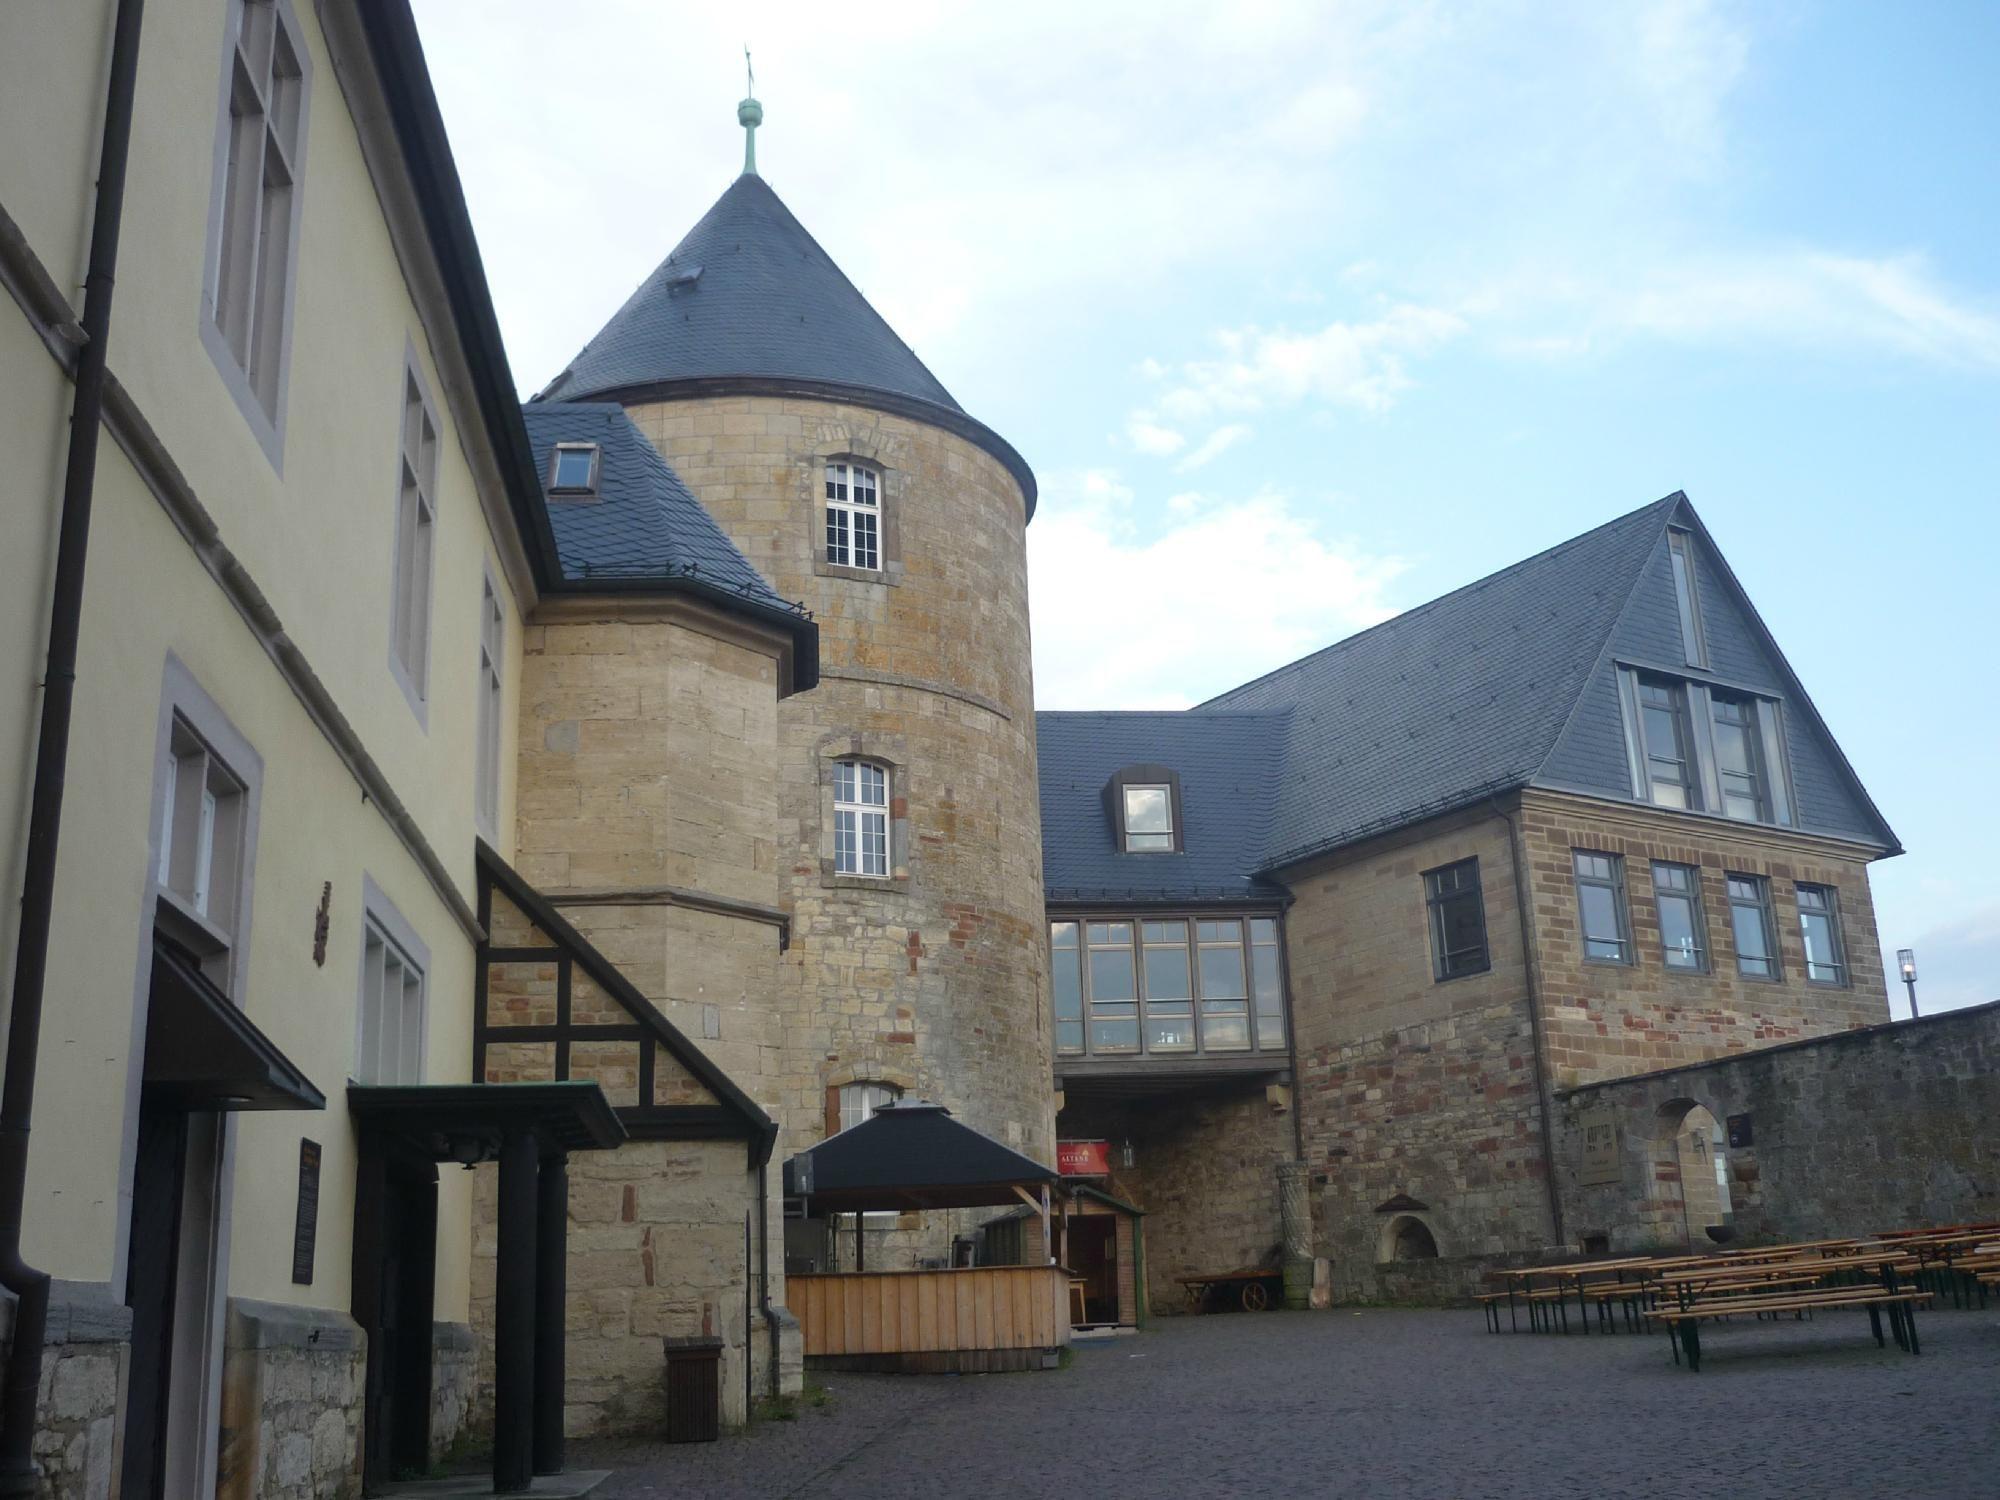 Hotel Schloss Waldeck (Germany)